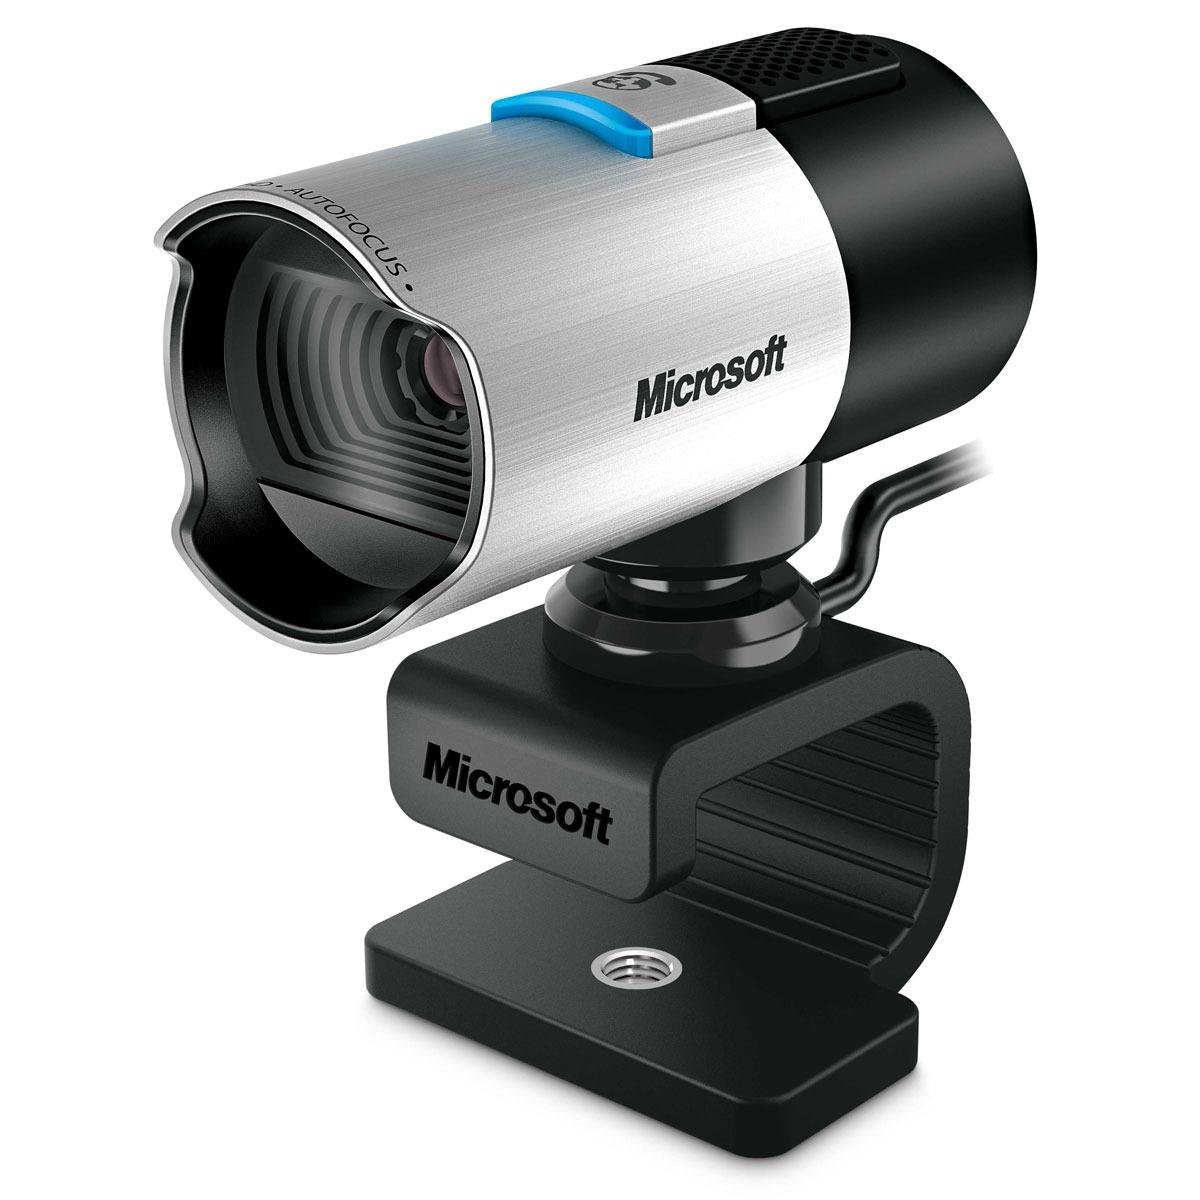 Webcam Microsoft Hardware for Business LifeCam Studio Microsoft Hardware for Business LifeCam Studio - Webcam Full HD 1080p